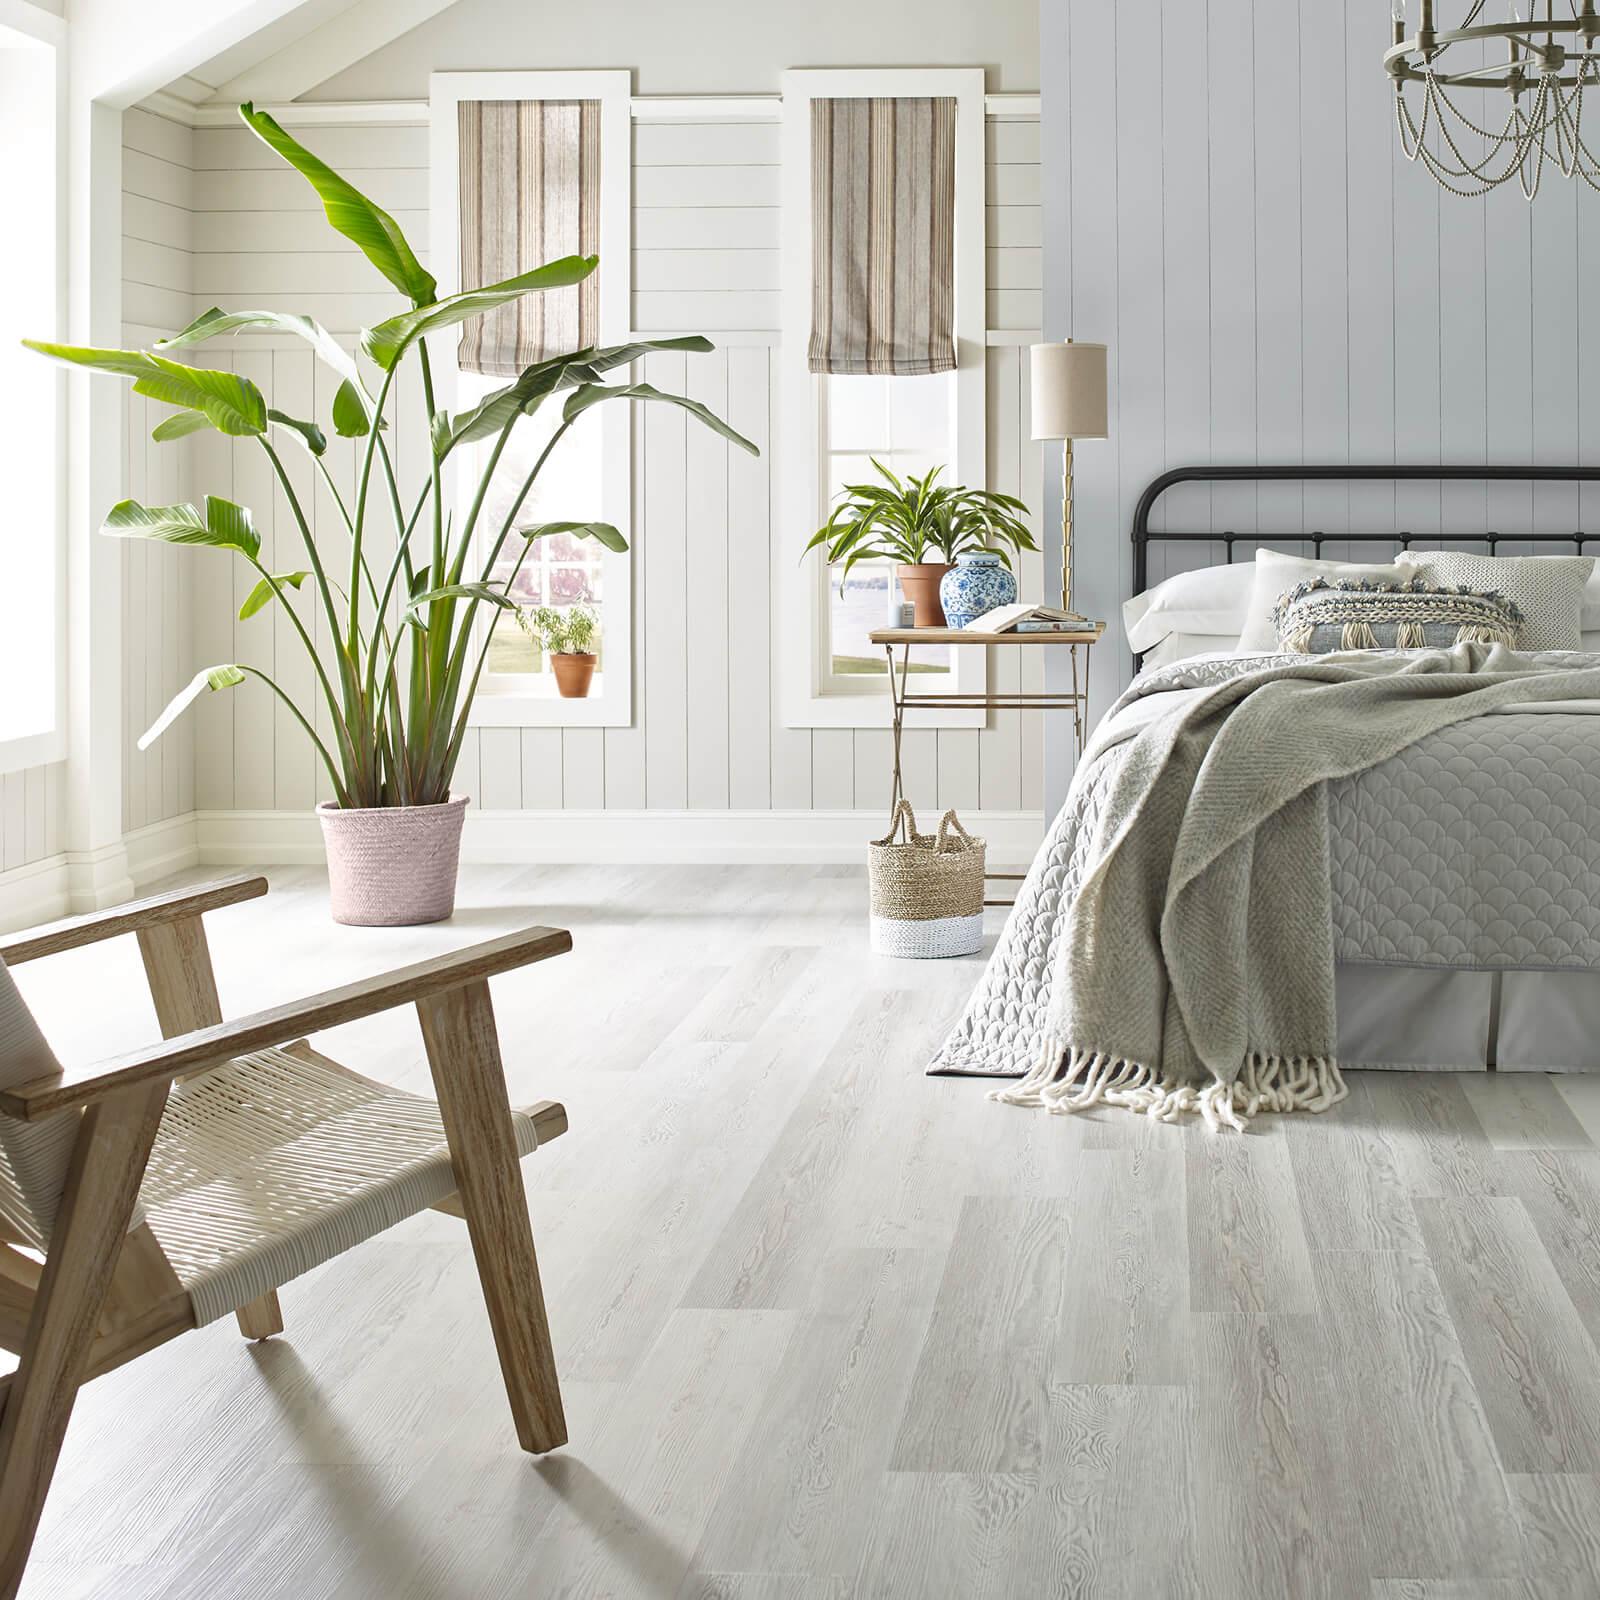 vinyl flooring in bedroom | Dolphin Carpet & Tile